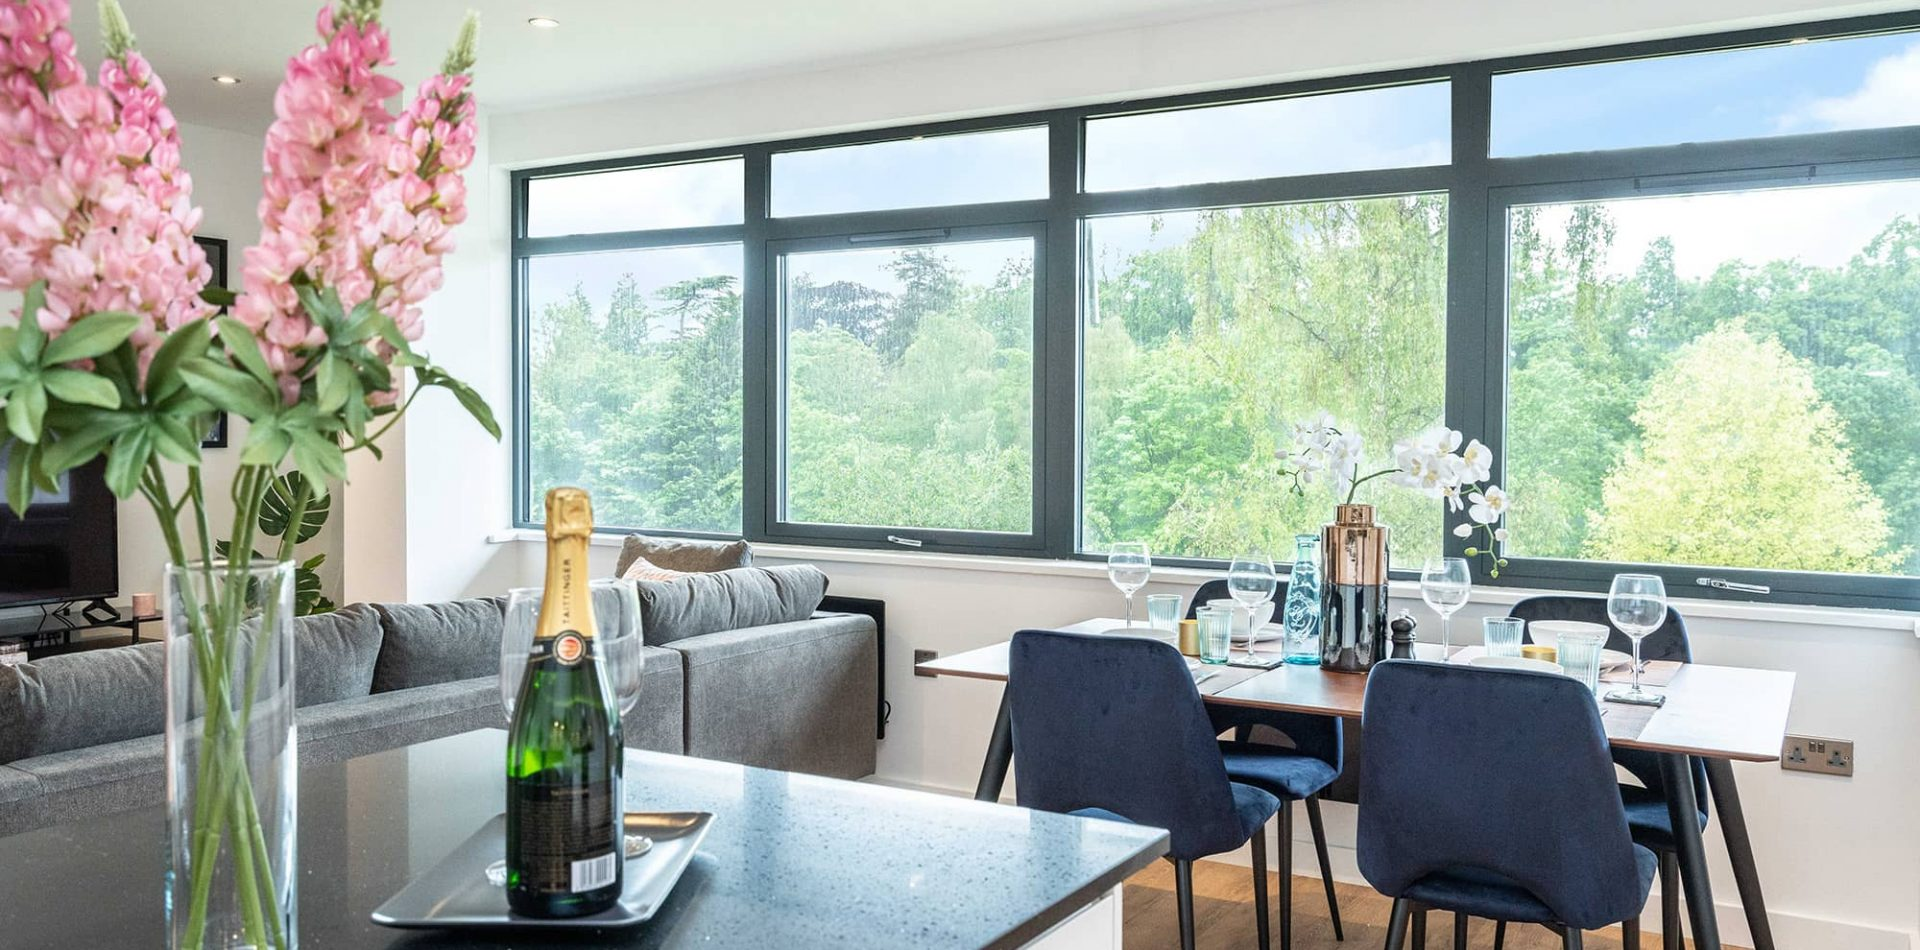 Surrey new build homes development